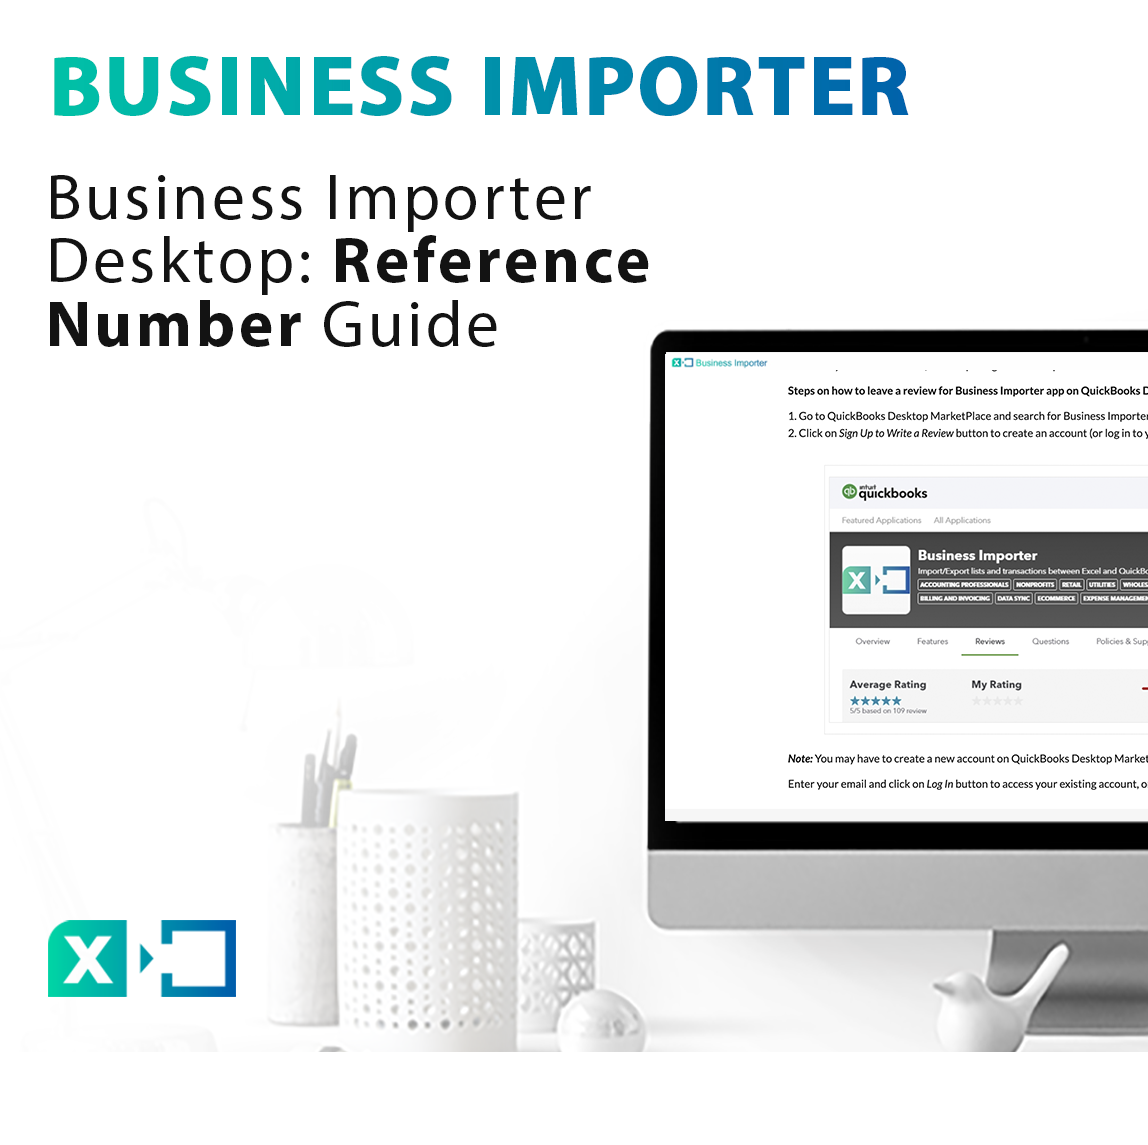 Business Importer Desktop